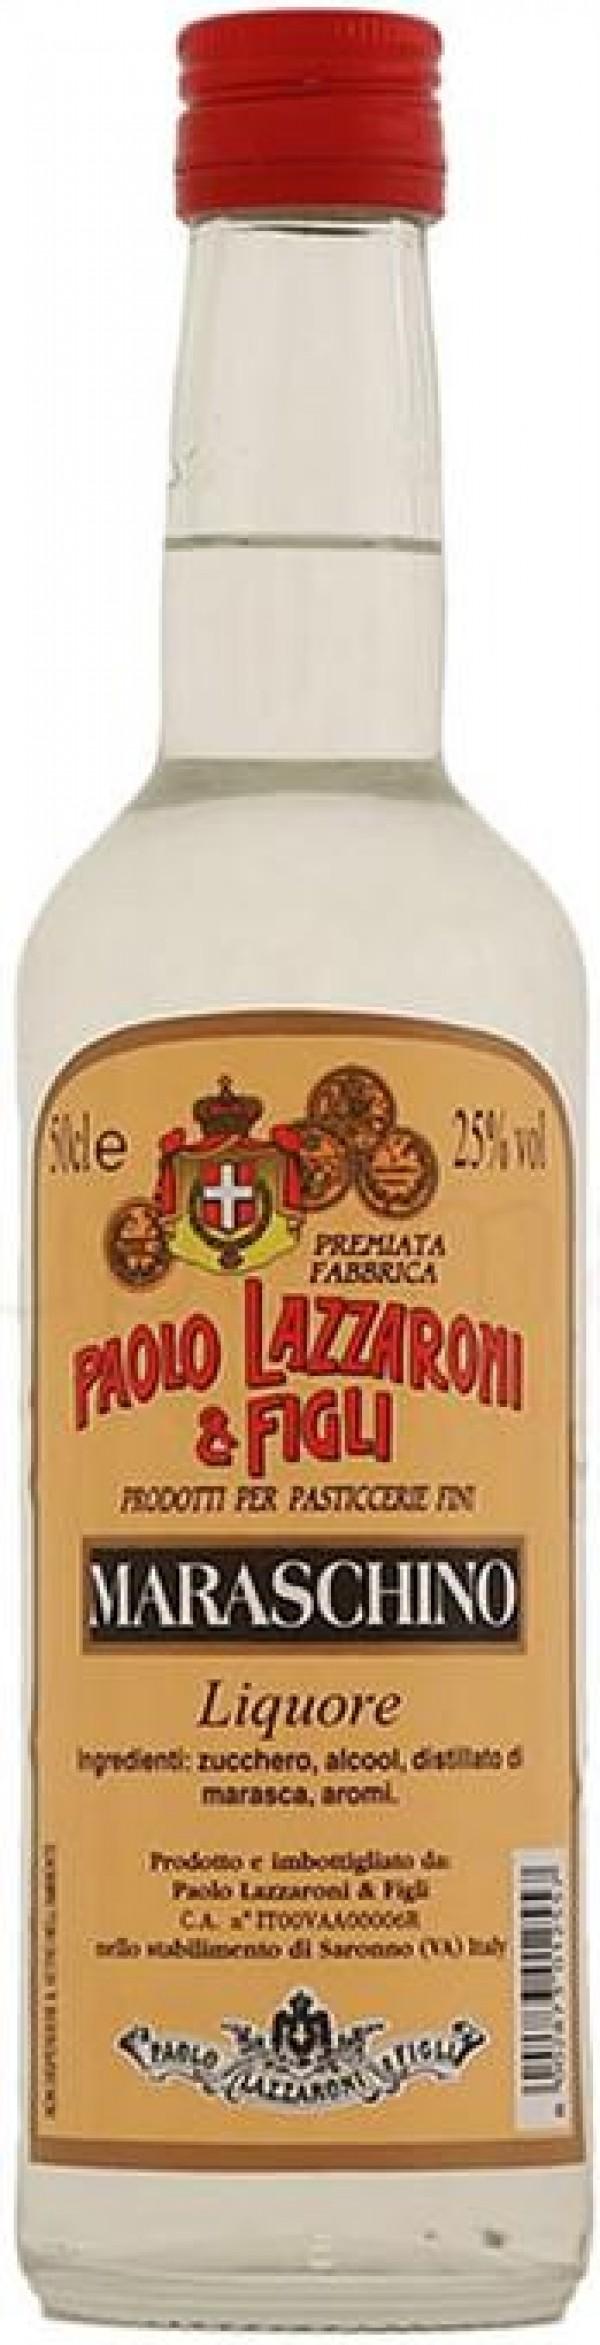 Lazzaroni Liquore Maraschino